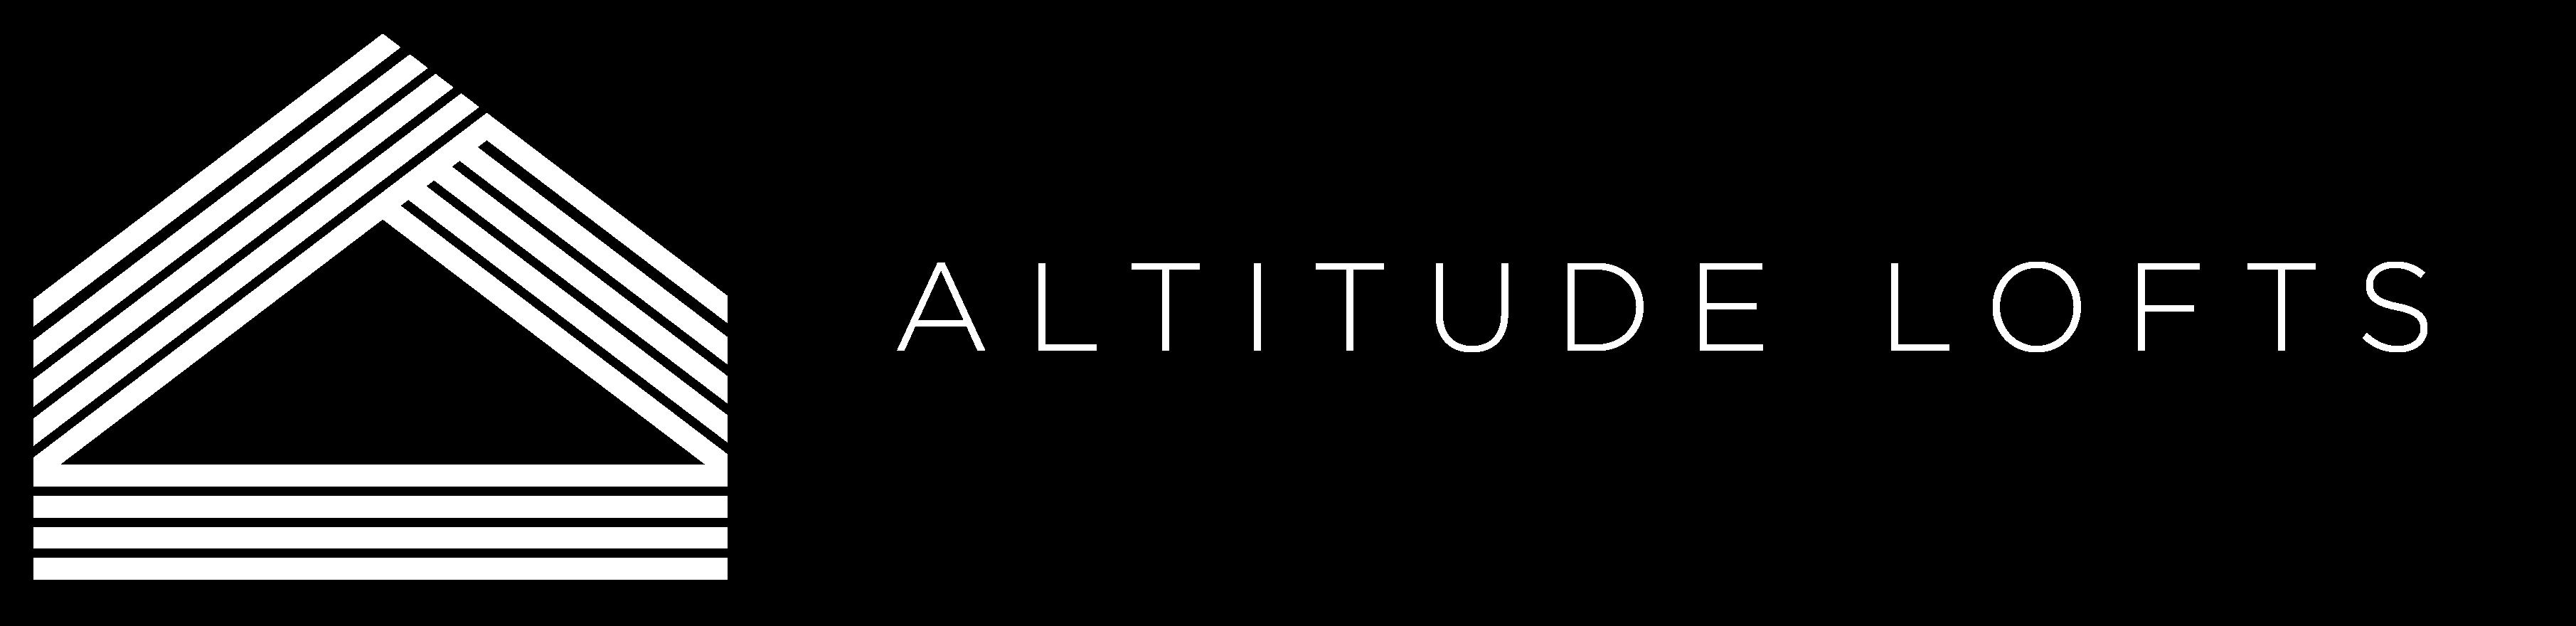 Altitude Lofts